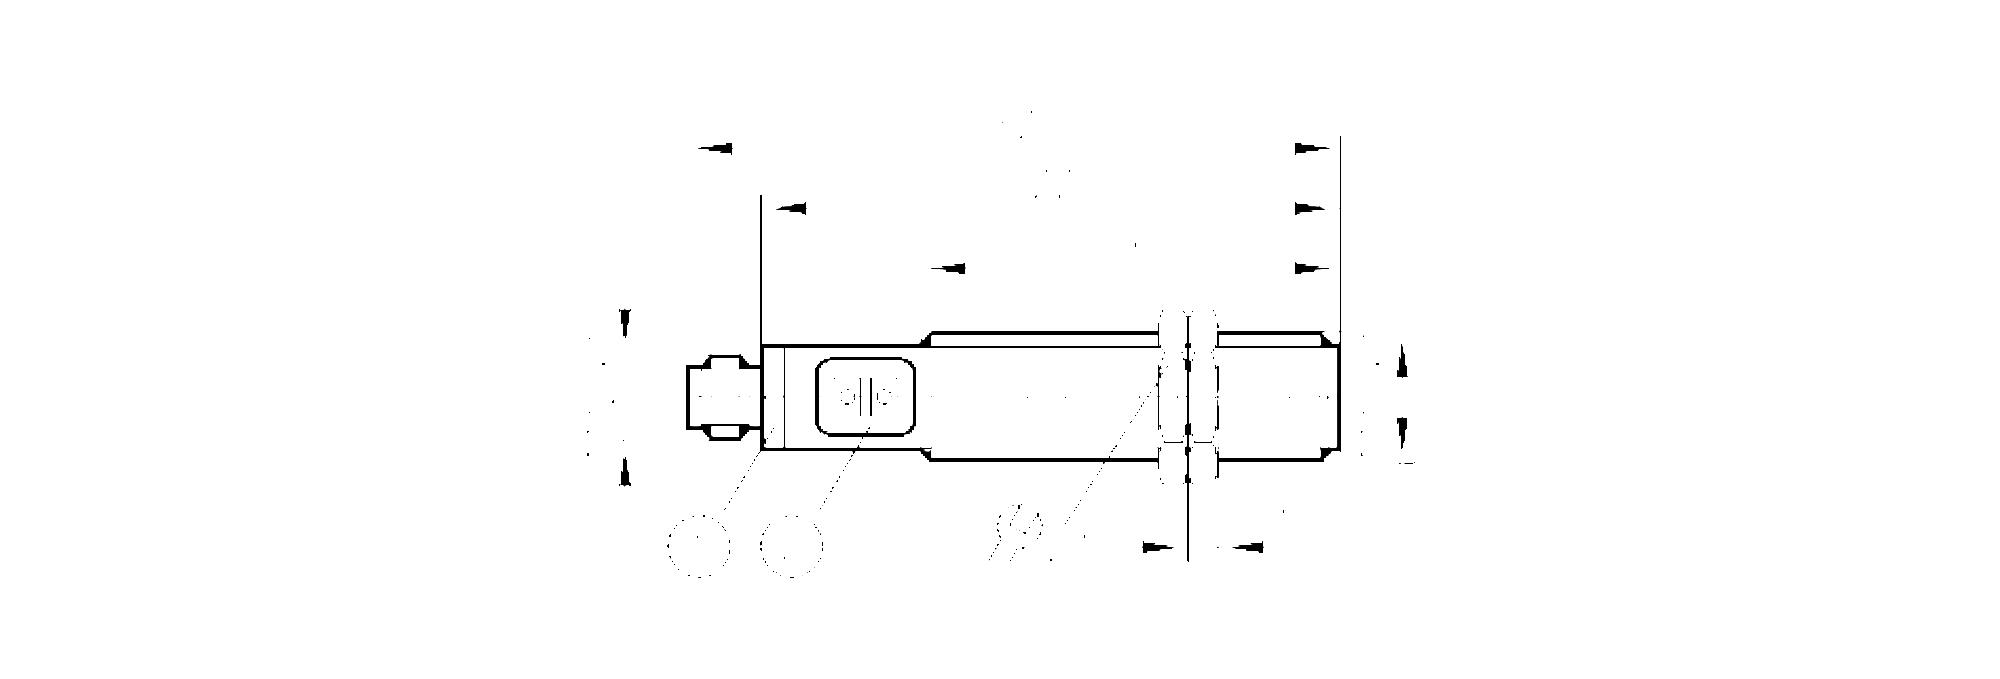 kg5066 - capacitive sensor